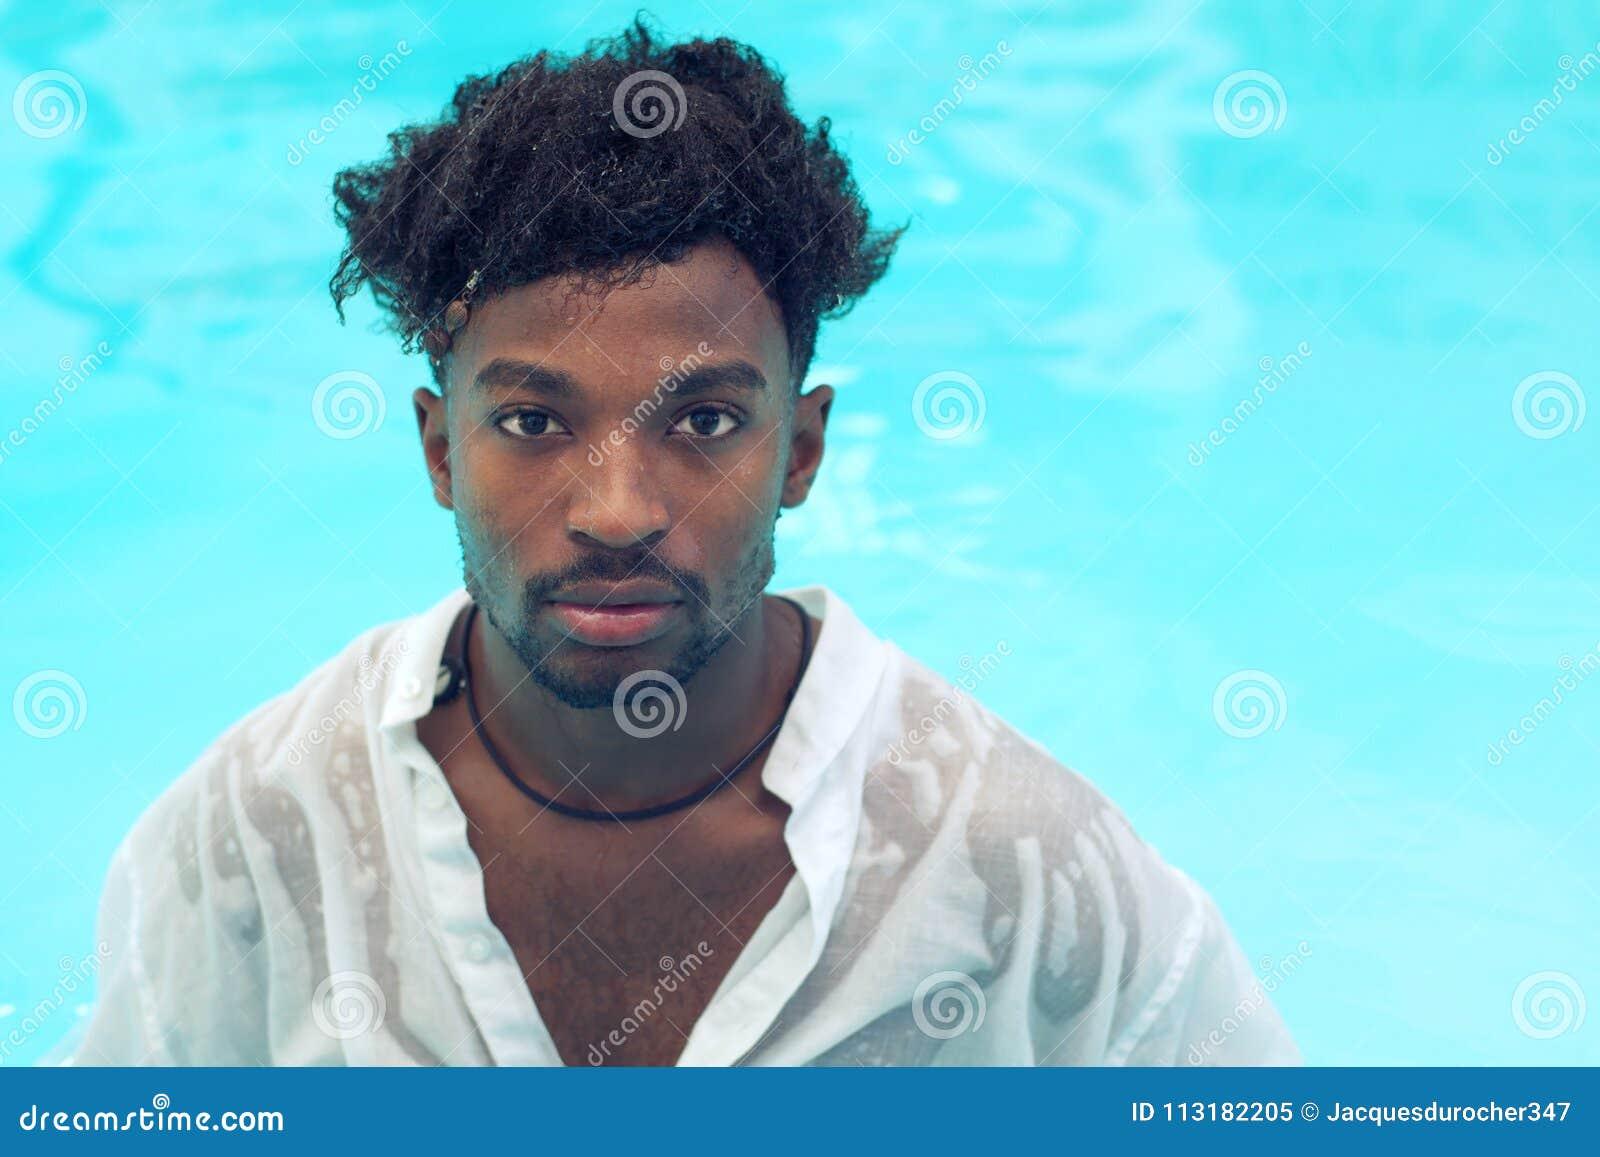 Young man wet shirt pool water swimming vacation